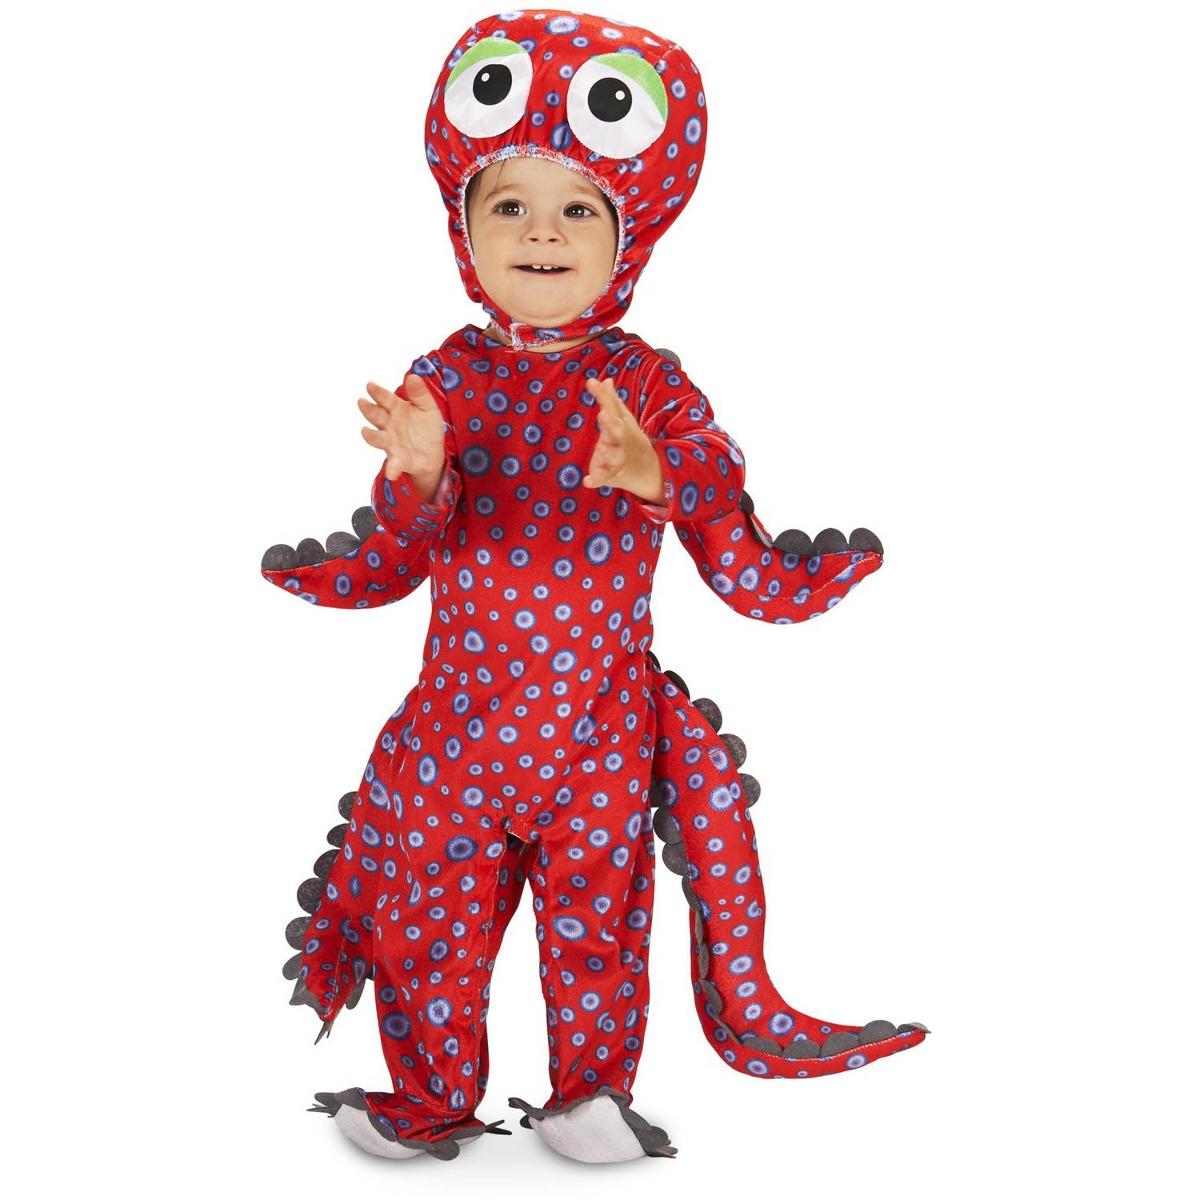 c638fb71d Disfraz Para Niño Pulpo Talla 6-12 Meses- Halloween -   258.550 en ...